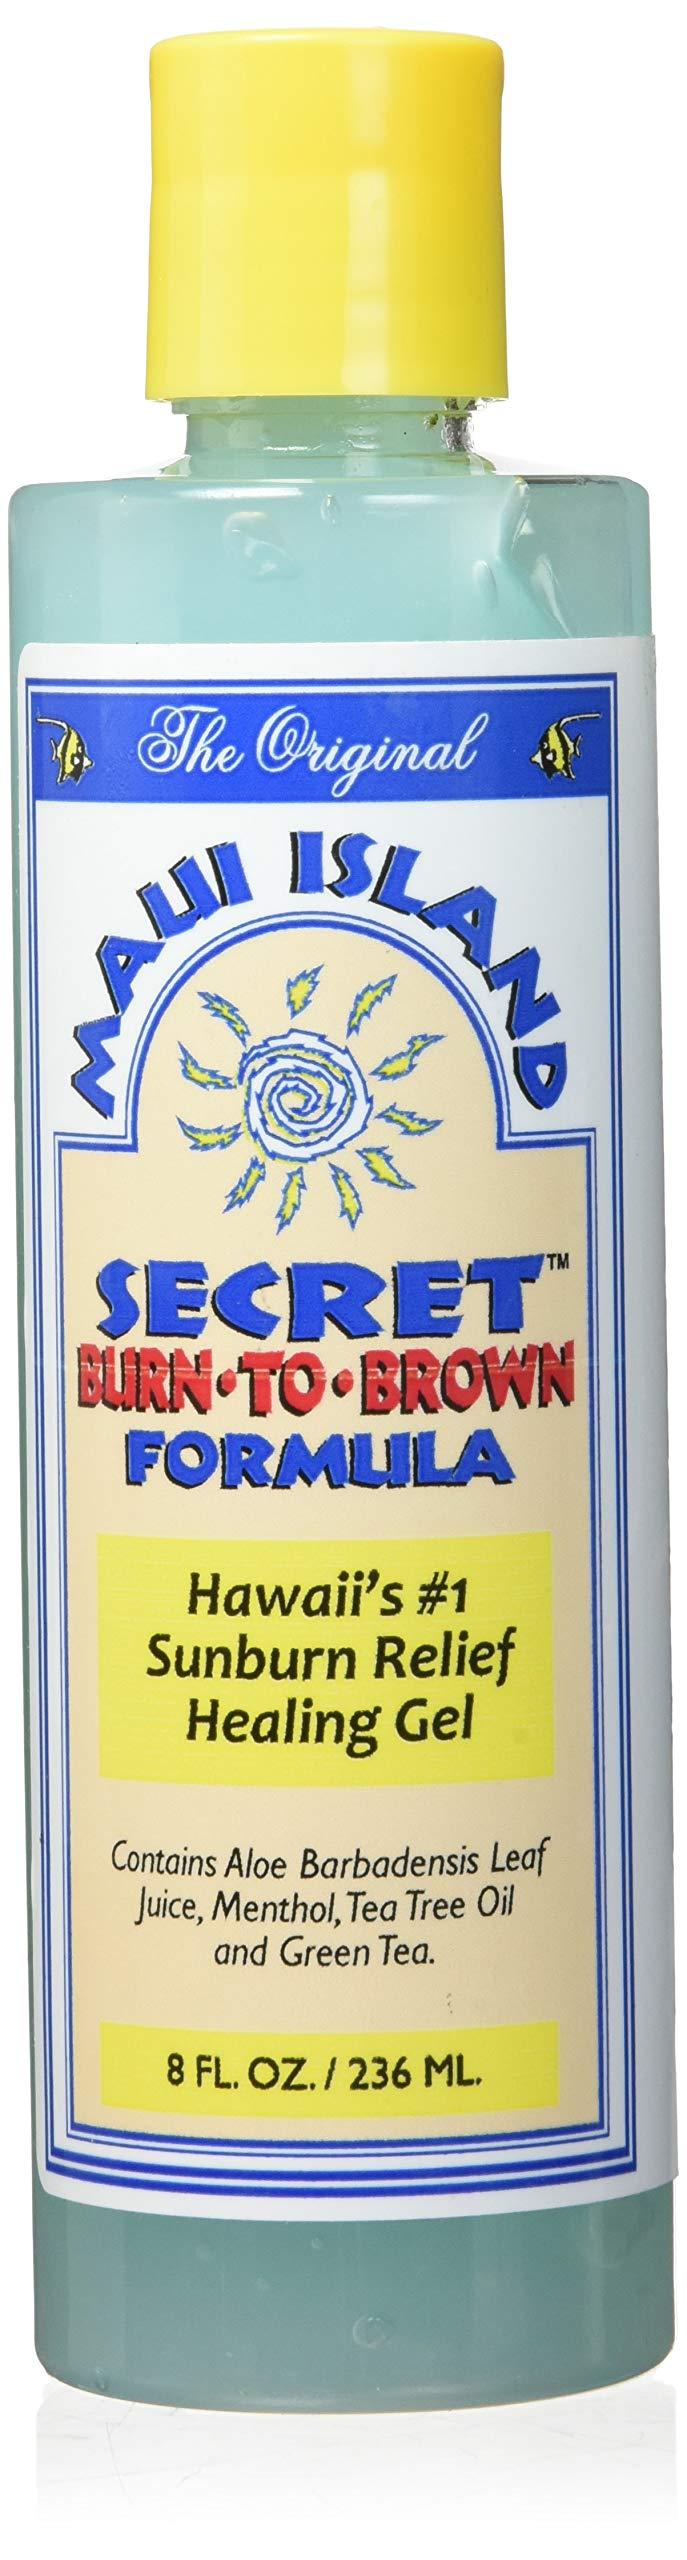 Maui Island Secret Burn to Brown Formula 8 Oz. by Maui Island Secret